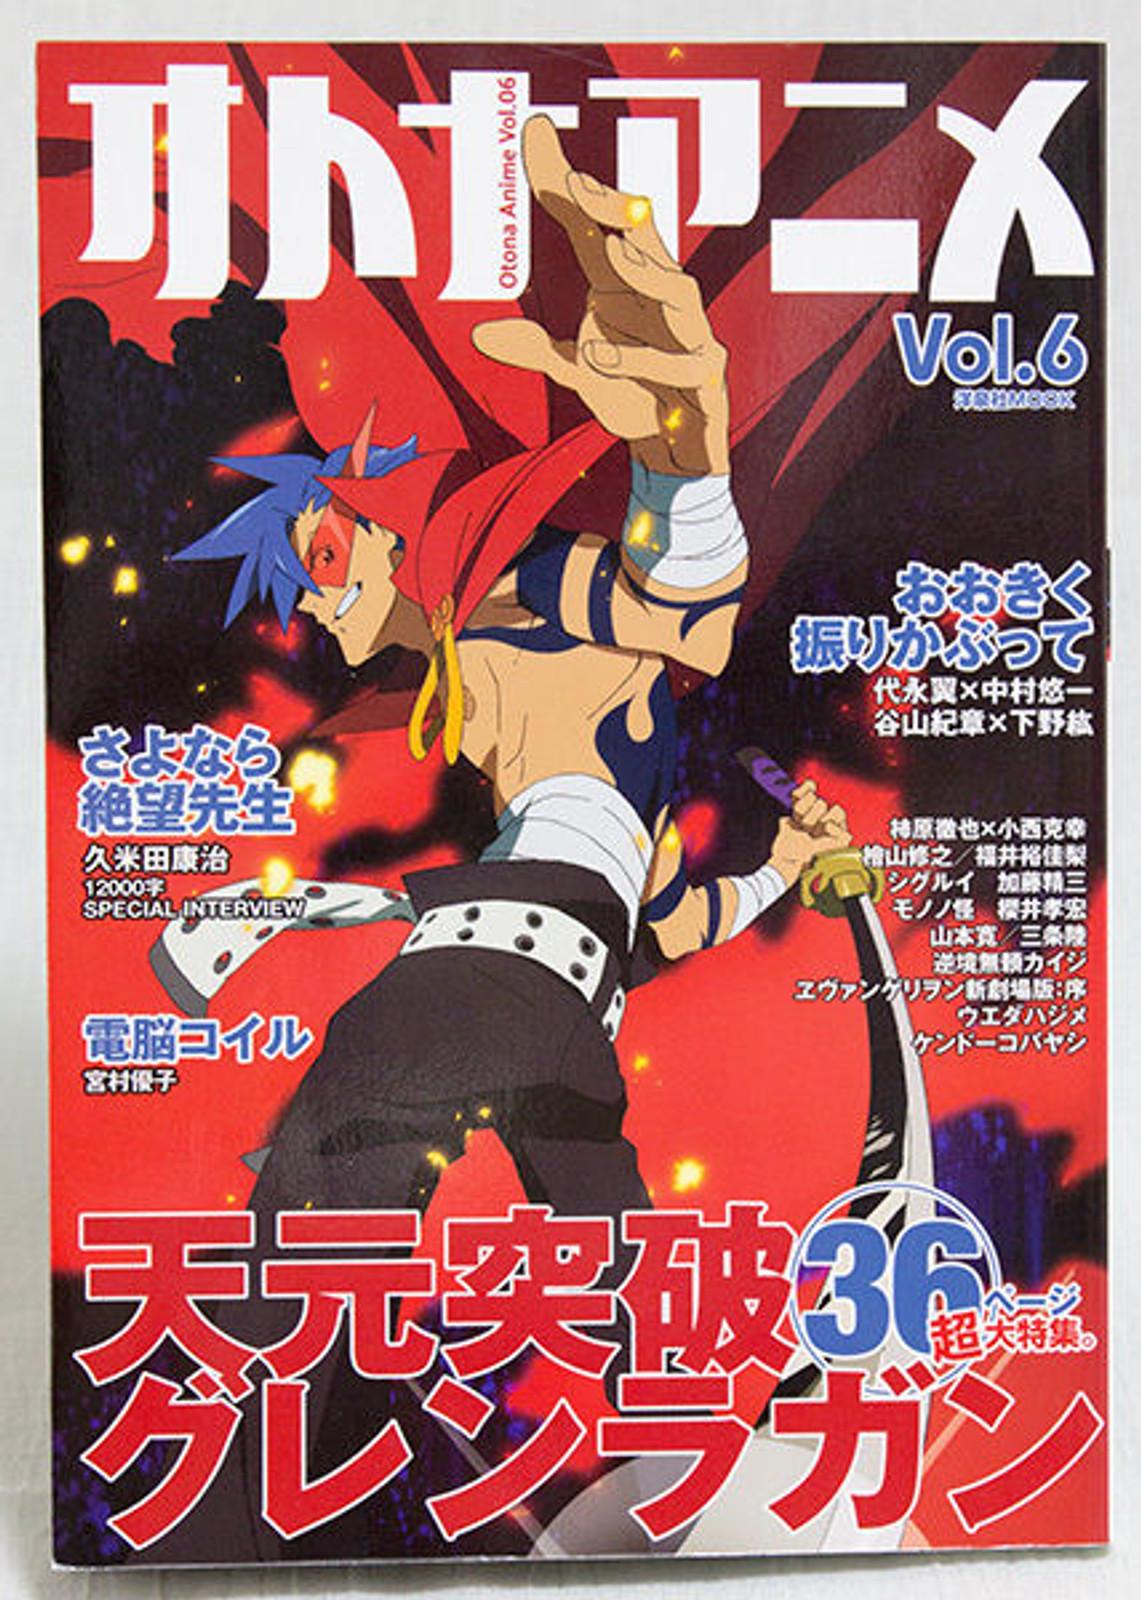 Otona Anime Vol.06 Japanese Magazine NOV/2007 JAPAN ANIME GURREN LAGANN/OOKIKU